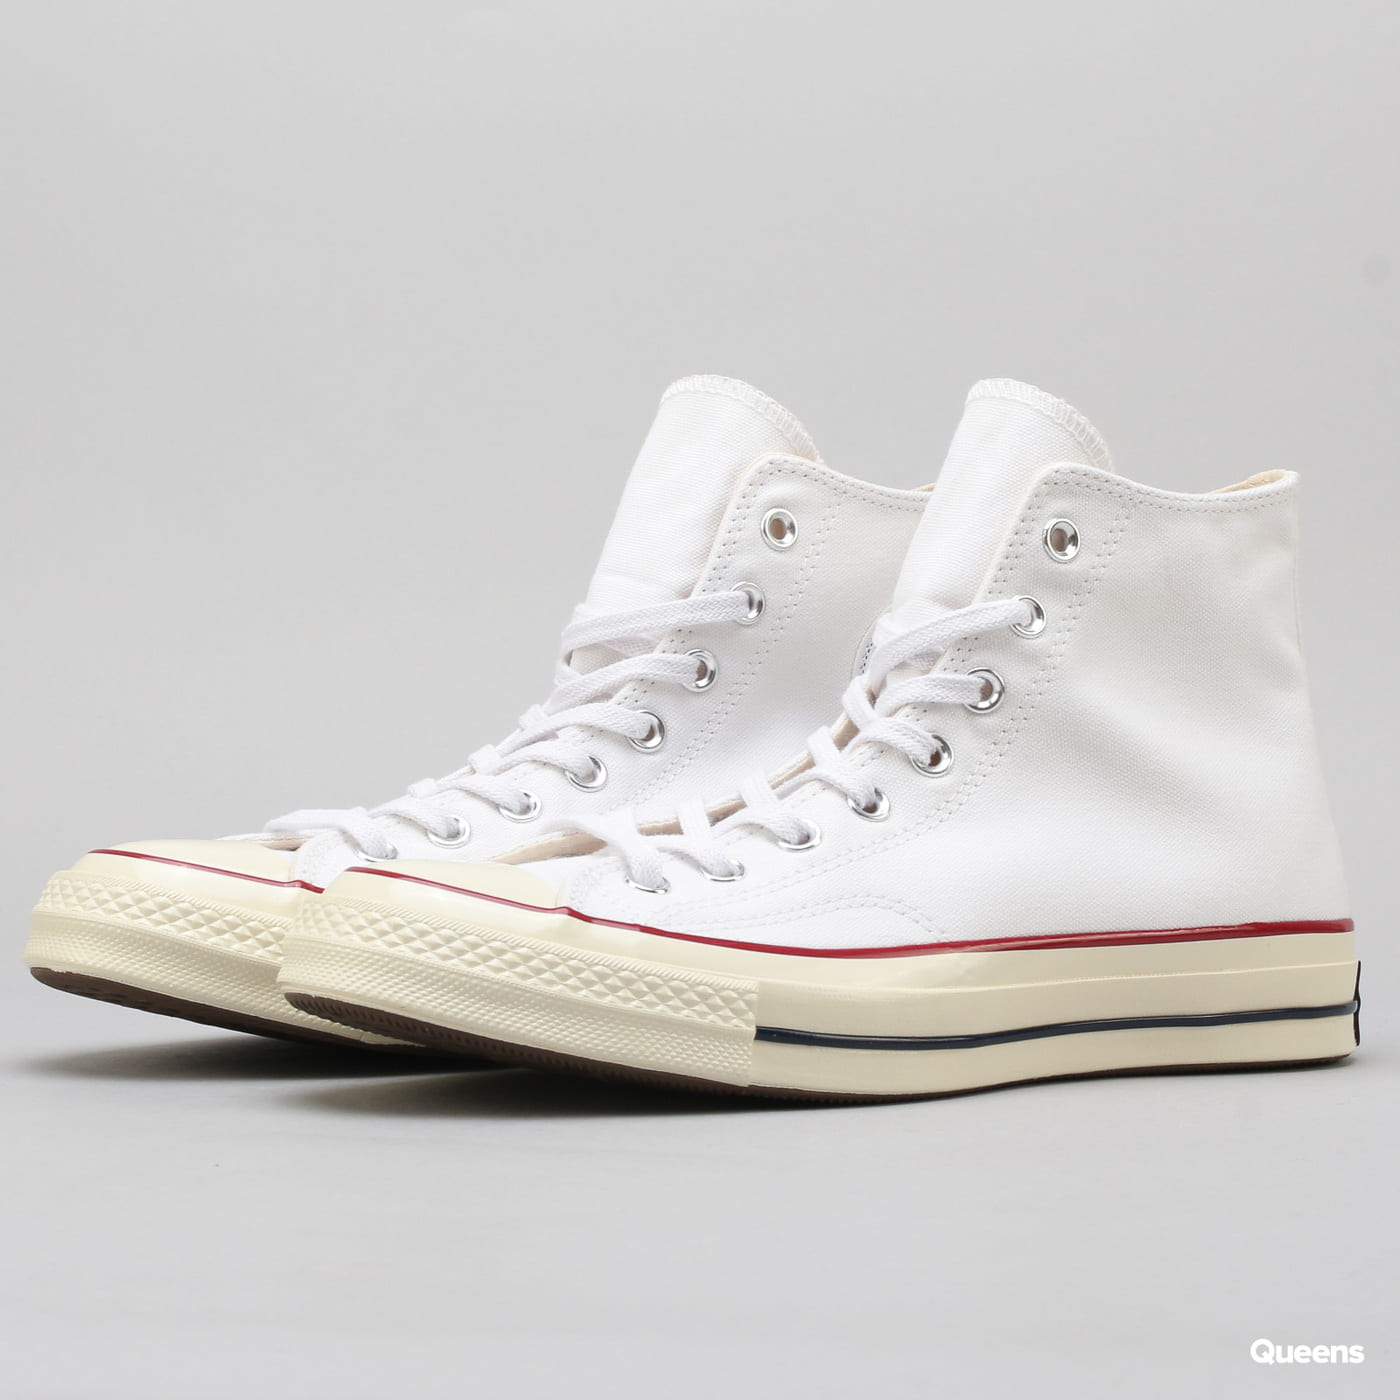 Converse Chuck Taylor All Stars 70 Hi white / garnet / egret